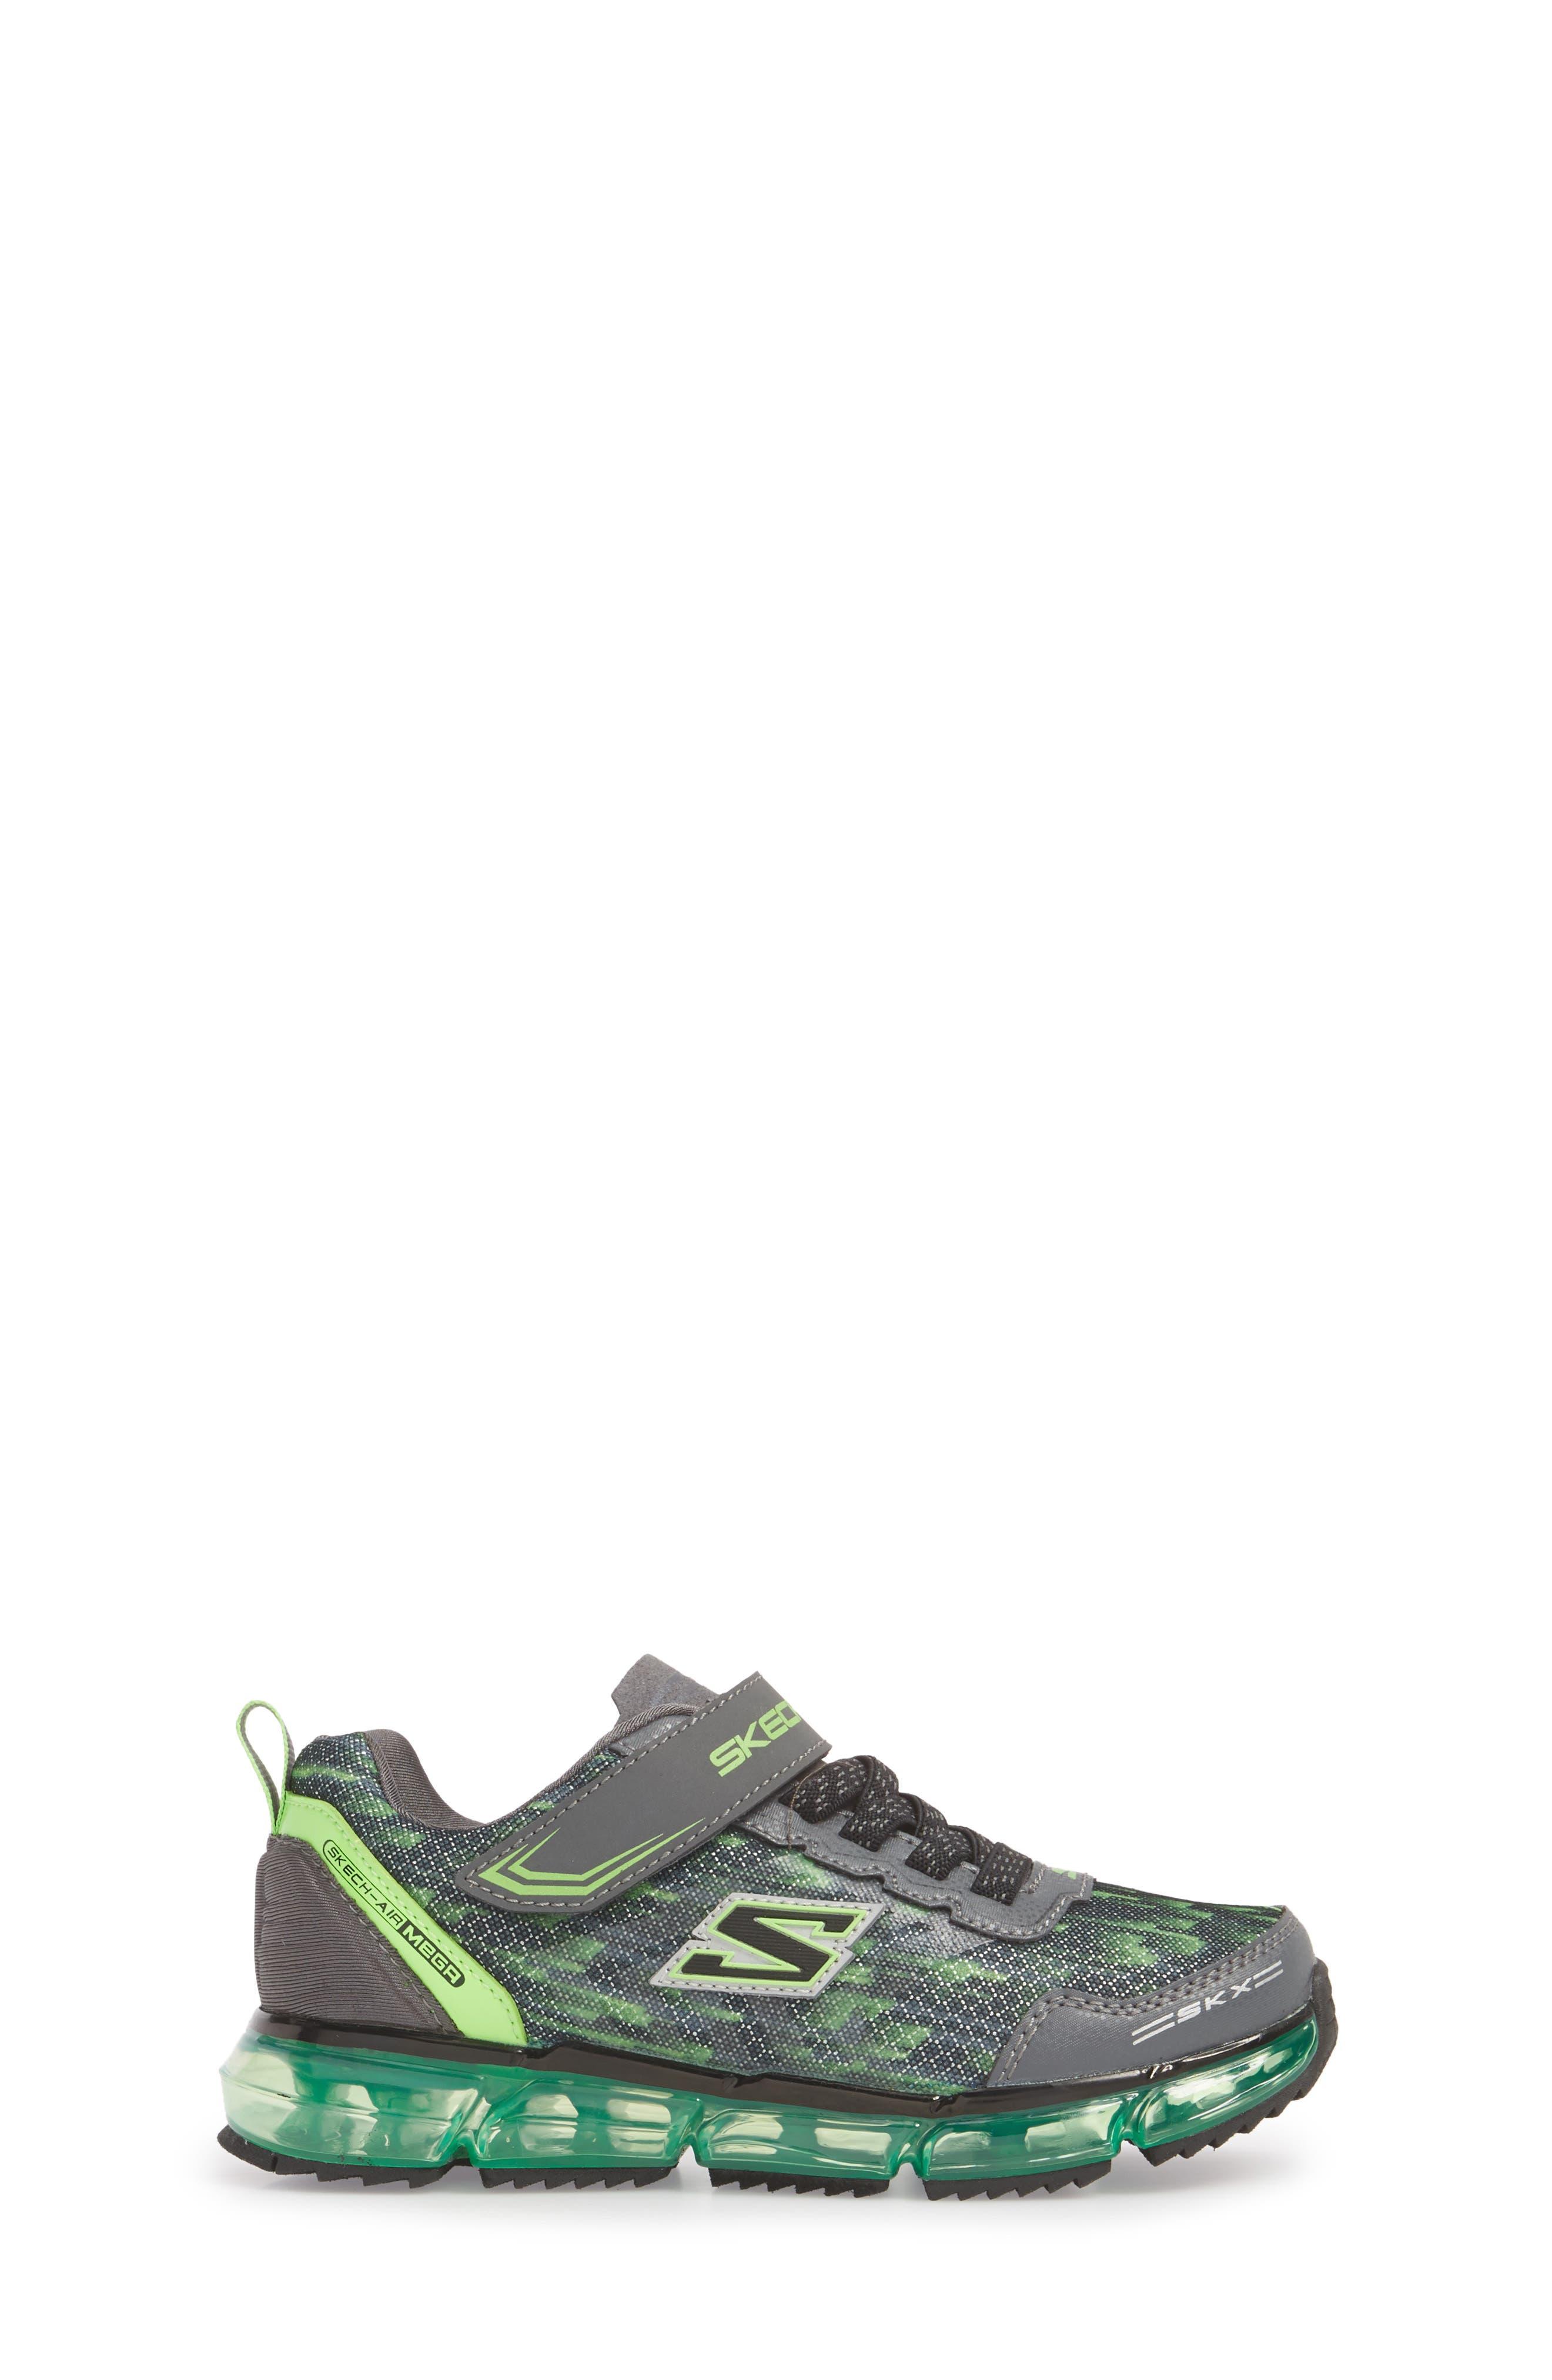 Skech-Air Mega Sneaker,                             Alternate thumbnail 3, color,                             Black/ Charcoal/ Lime